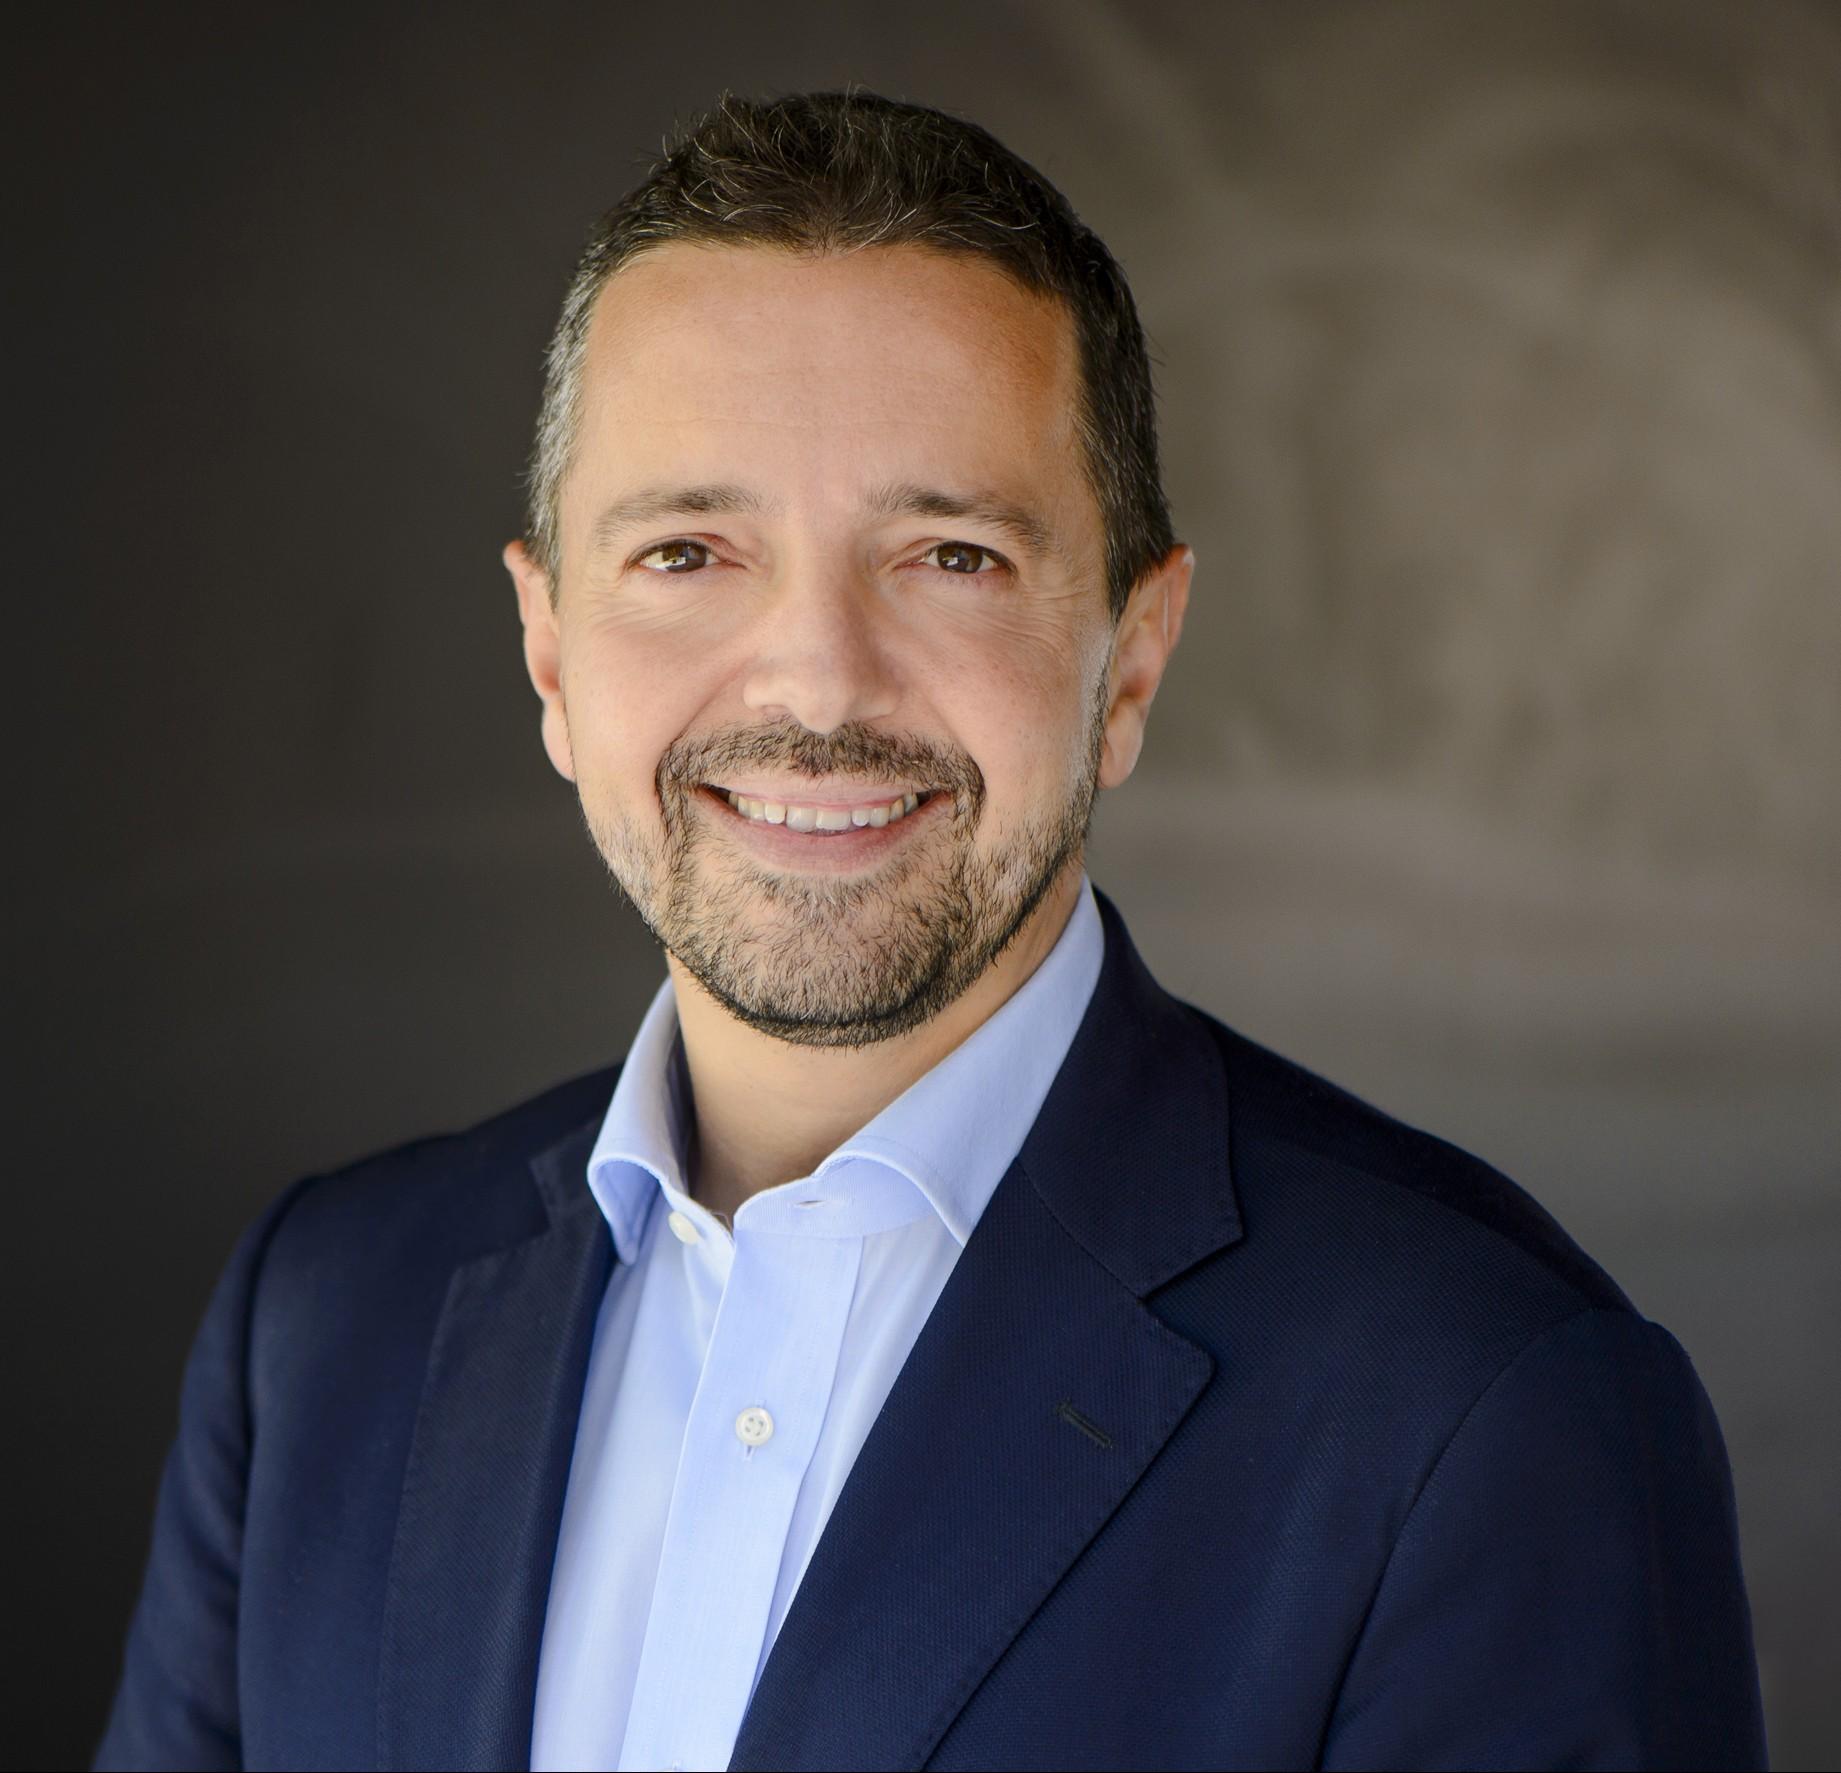 Miro Venturi, PhD